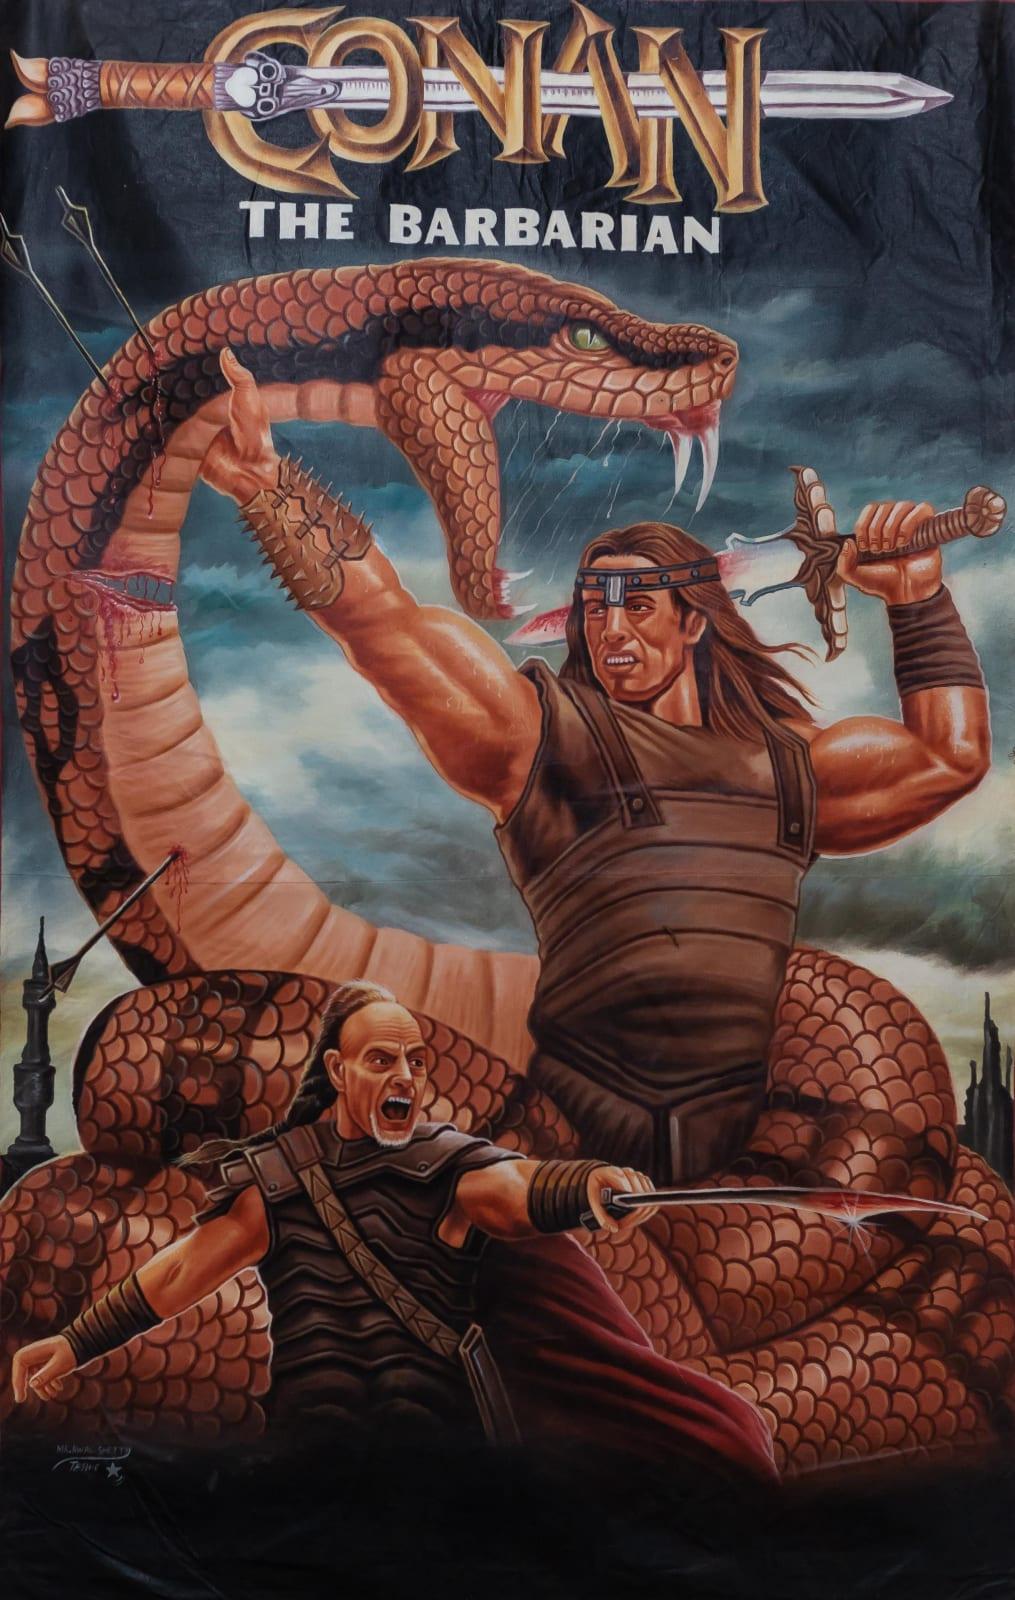 Conan the Barbarian 157 x 102 cm